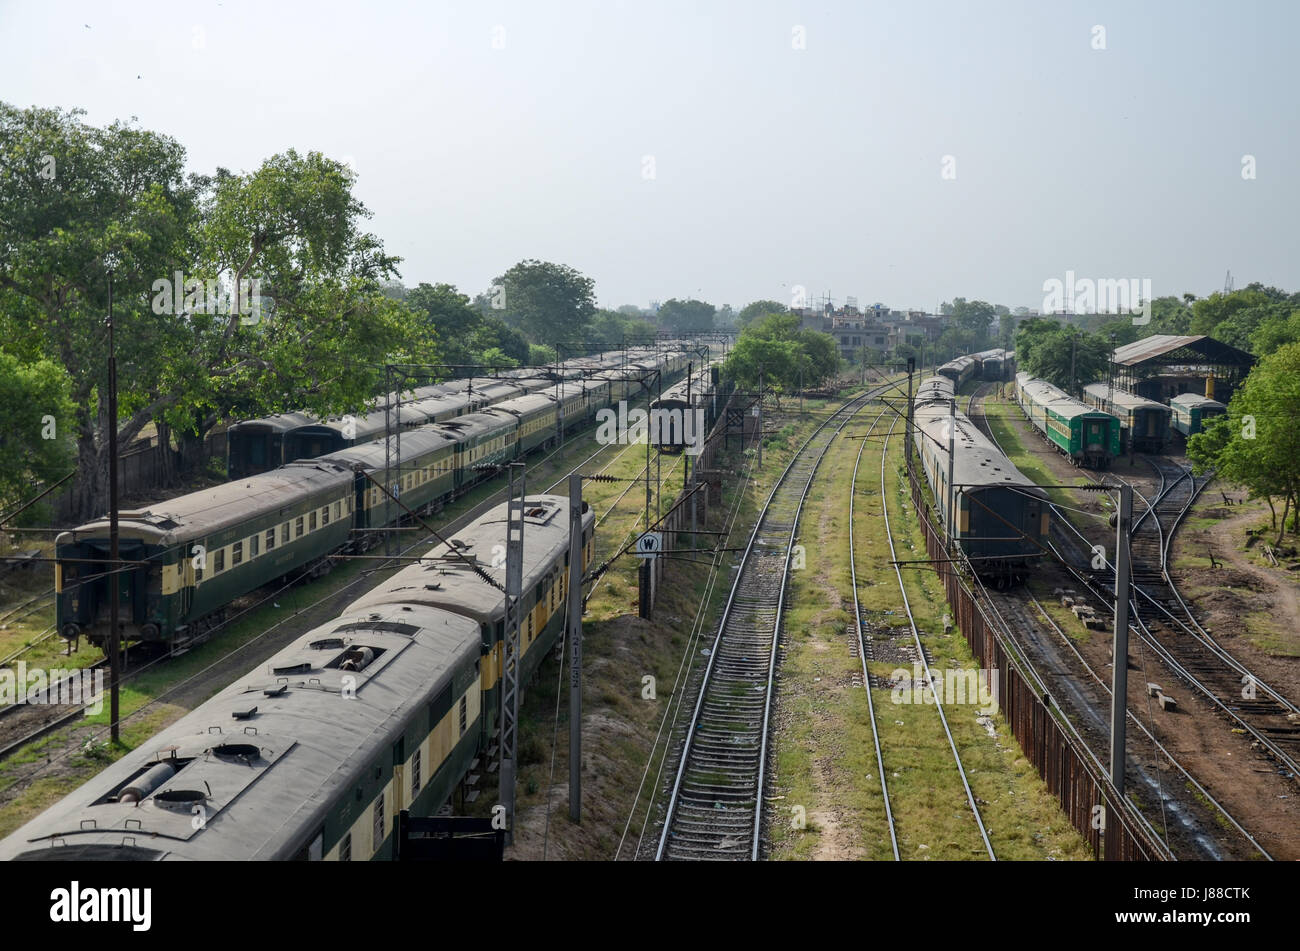 Pakistan Railway Stock Photos & Pakistan Railway Stock Images - Alamy